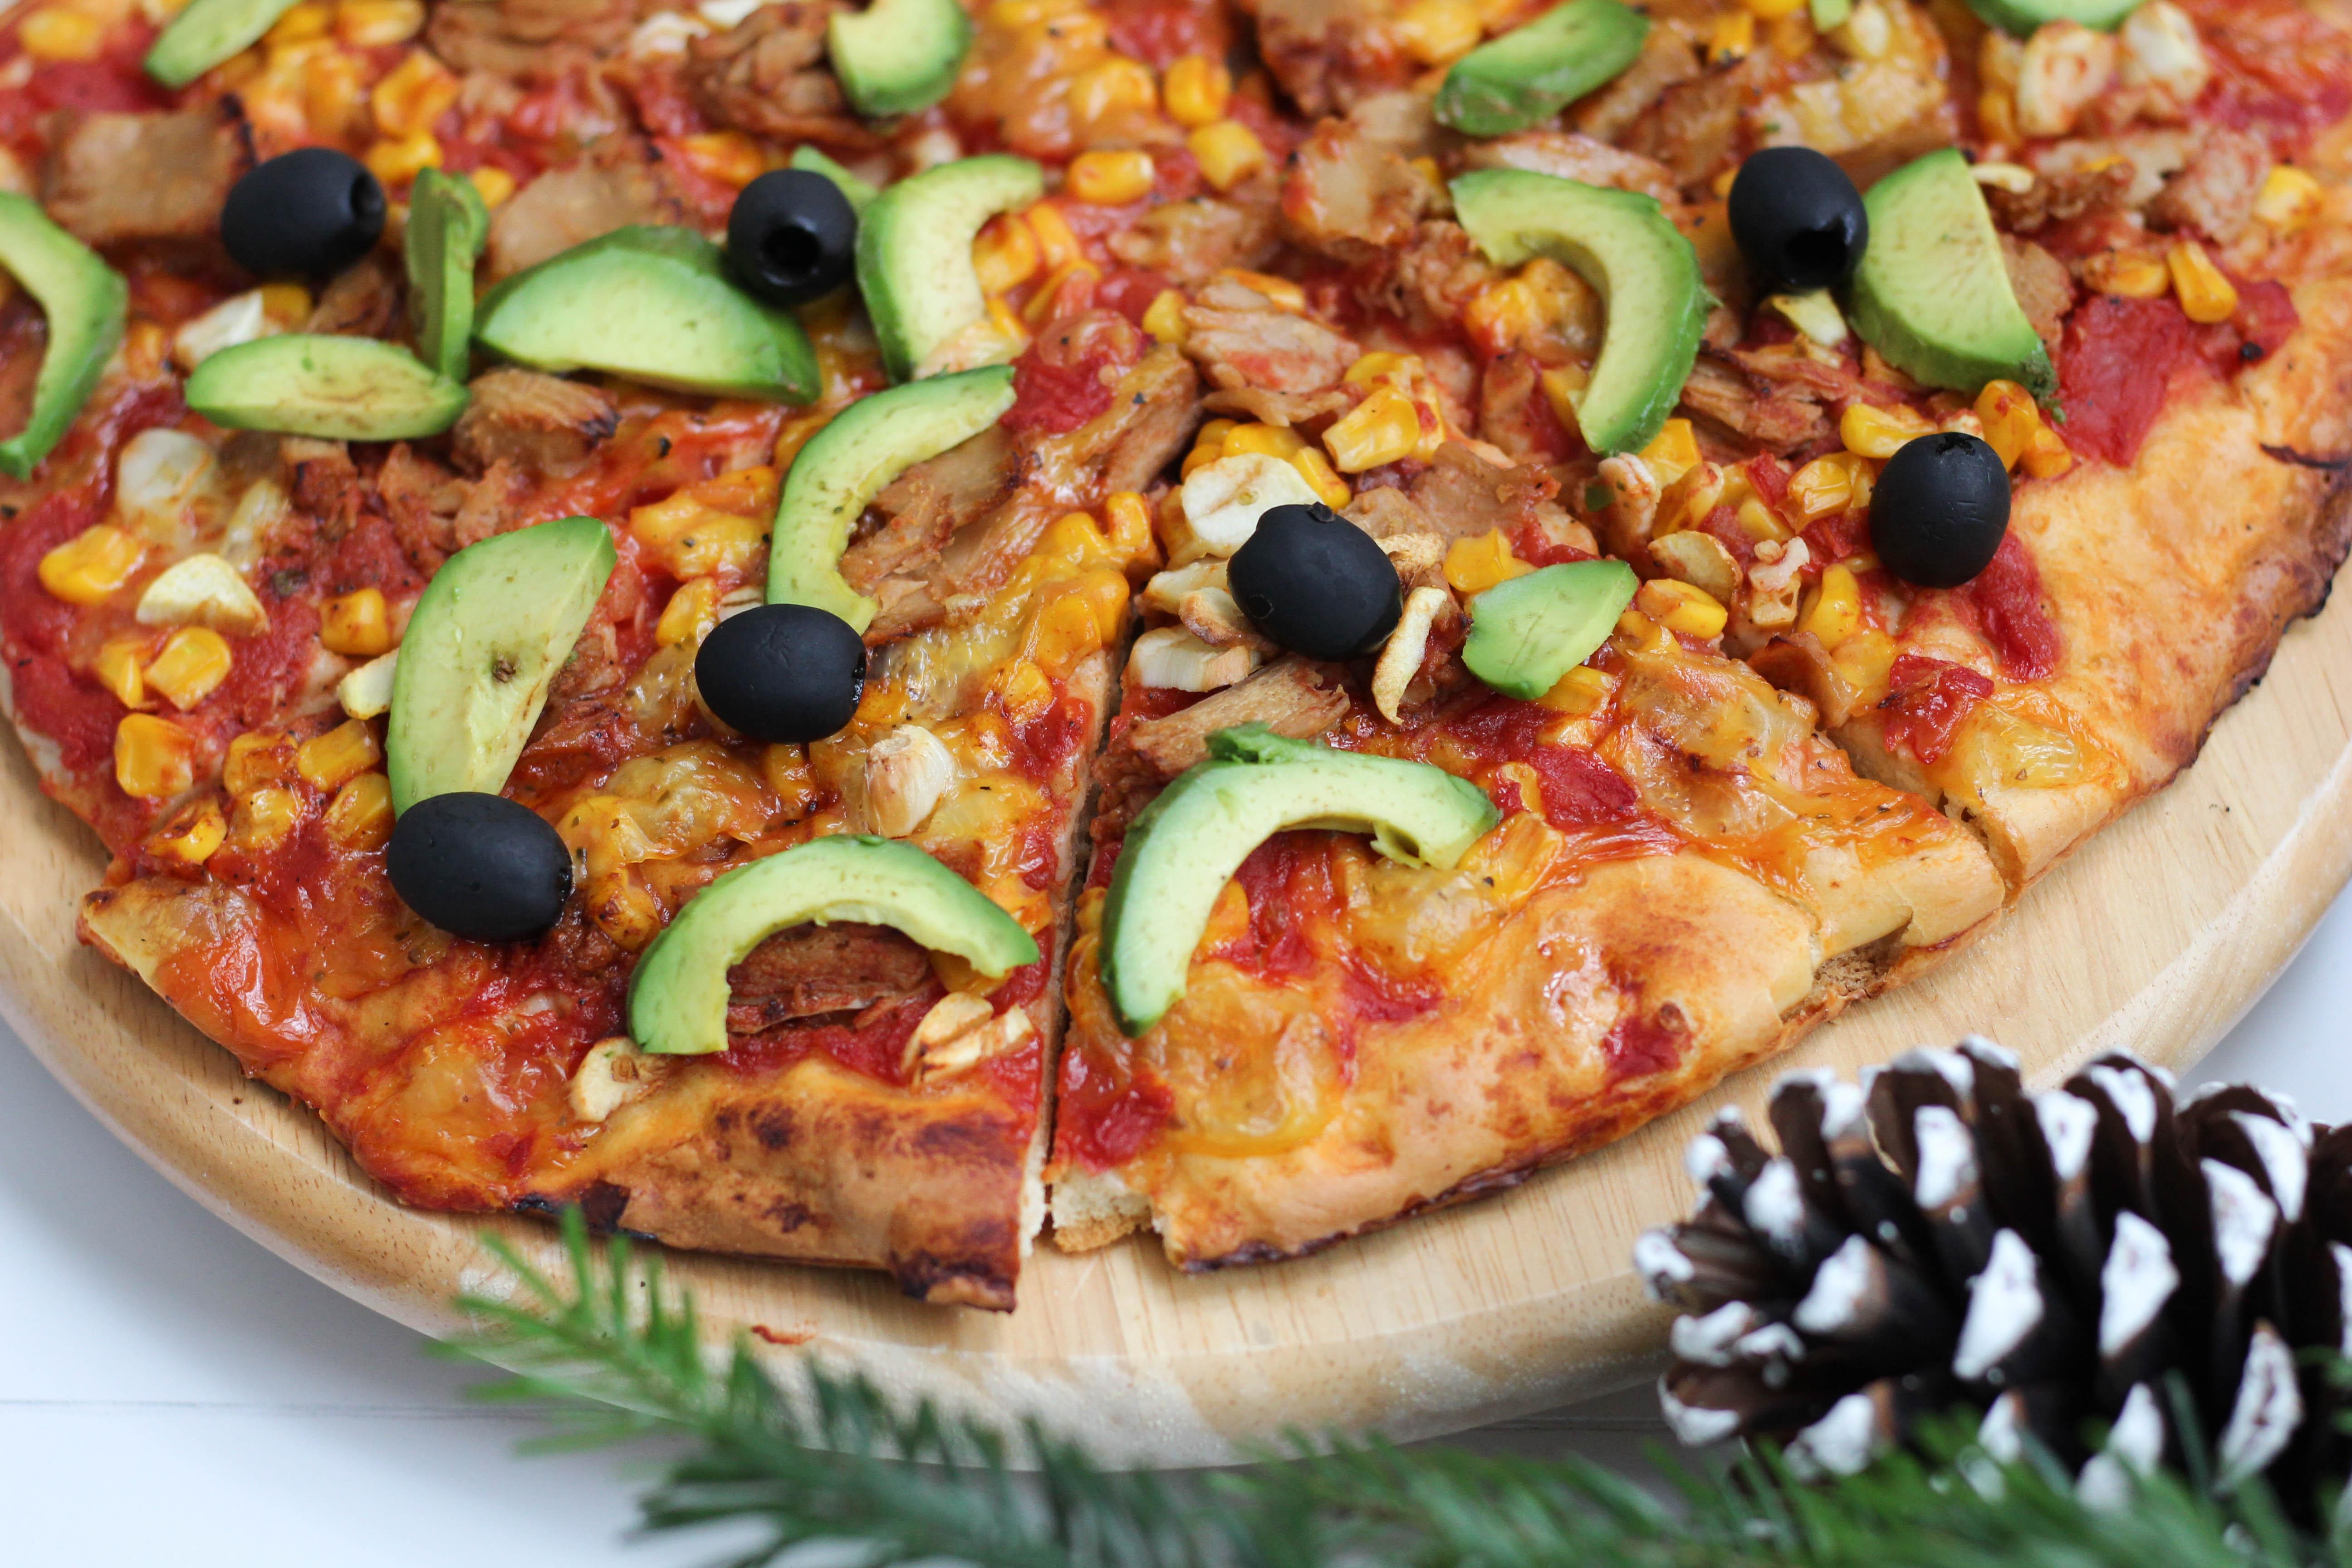 vegane pizza germteig gilmore girls homespa plantbased 1 von 1 6 dein homespa. Black Bedroom Furniture Sets. Home Design Ideas